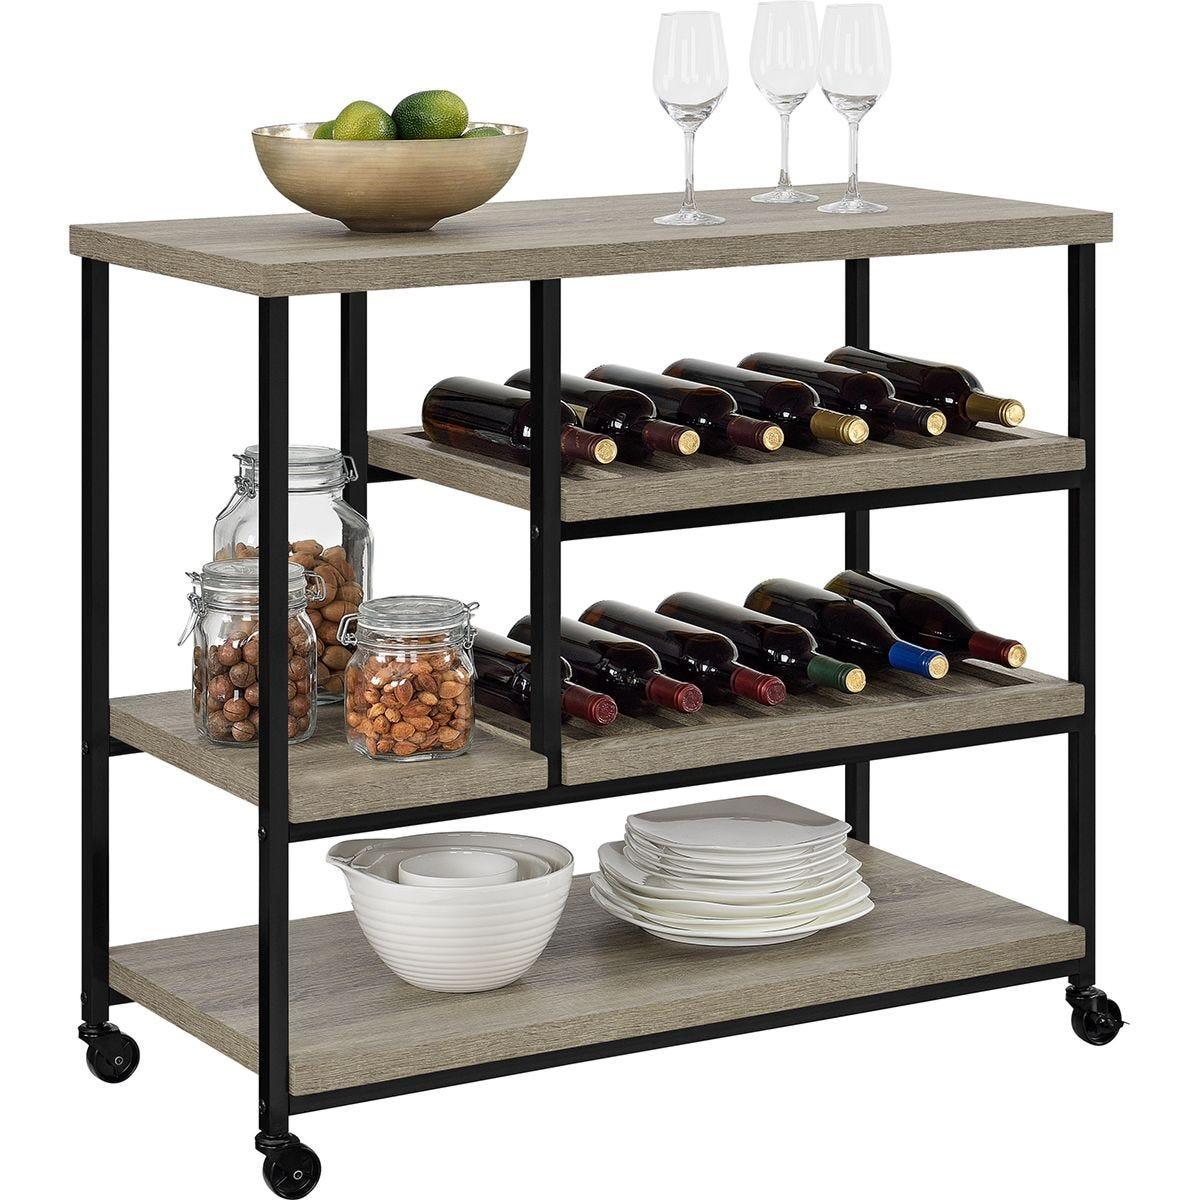 Dorel Elmwood Multi-Purpose Rolling Cart - Grey Oak